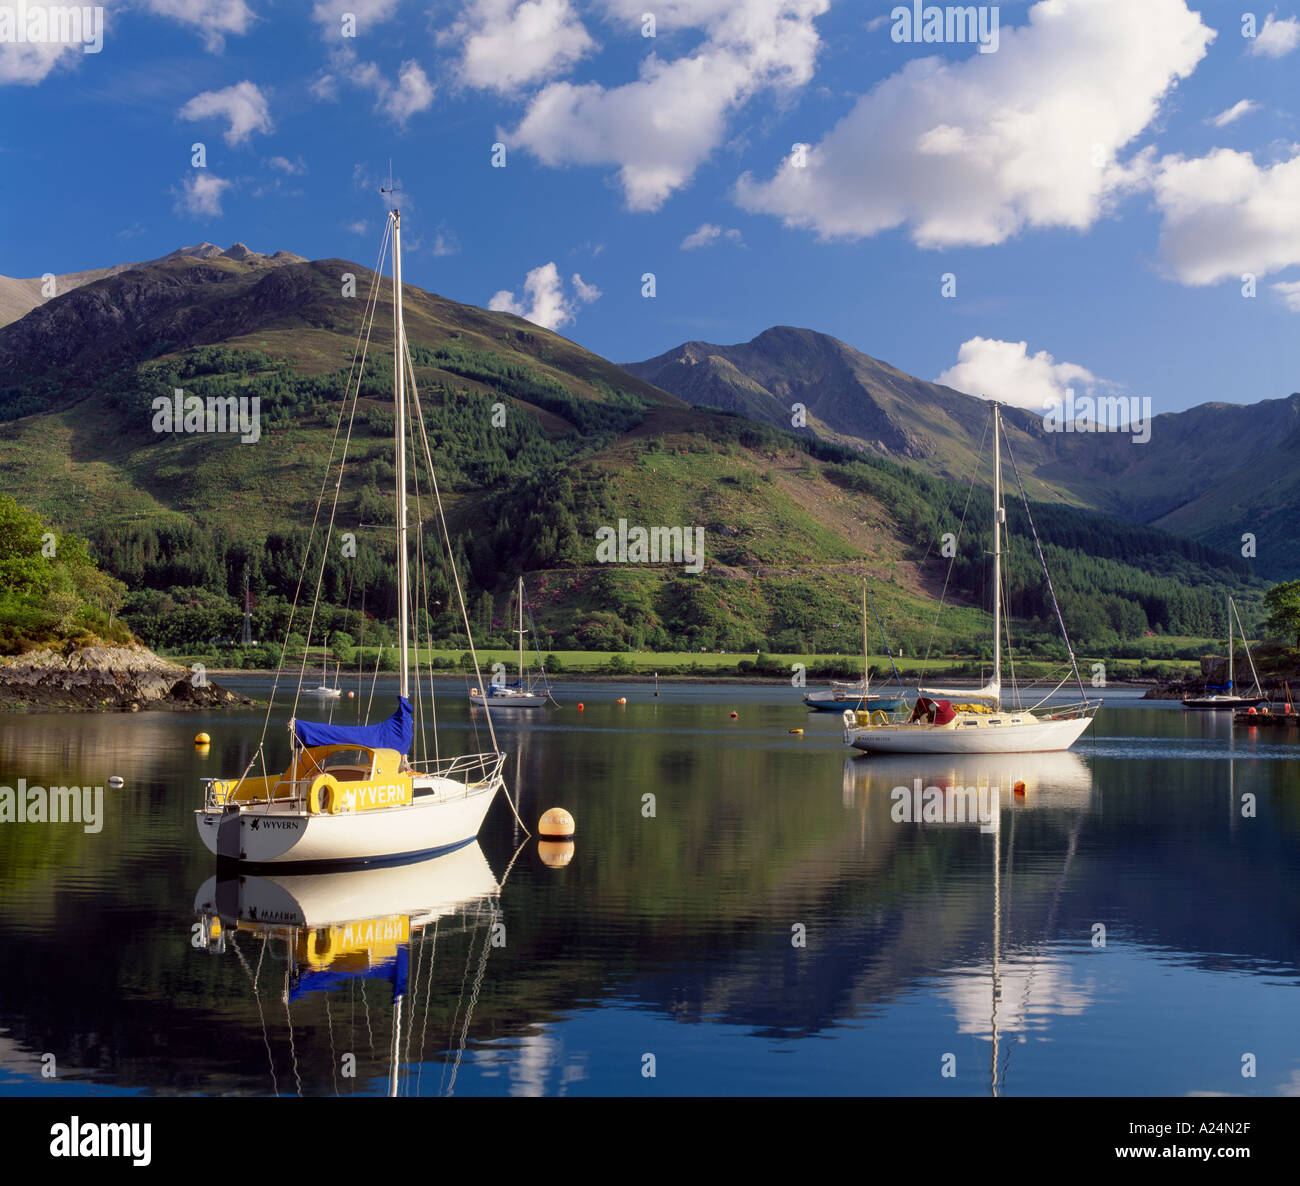 Bishops Bay on Loch Leven near North Ballachulish, Lochaber, Highland, Scotland, UK - Stock Image